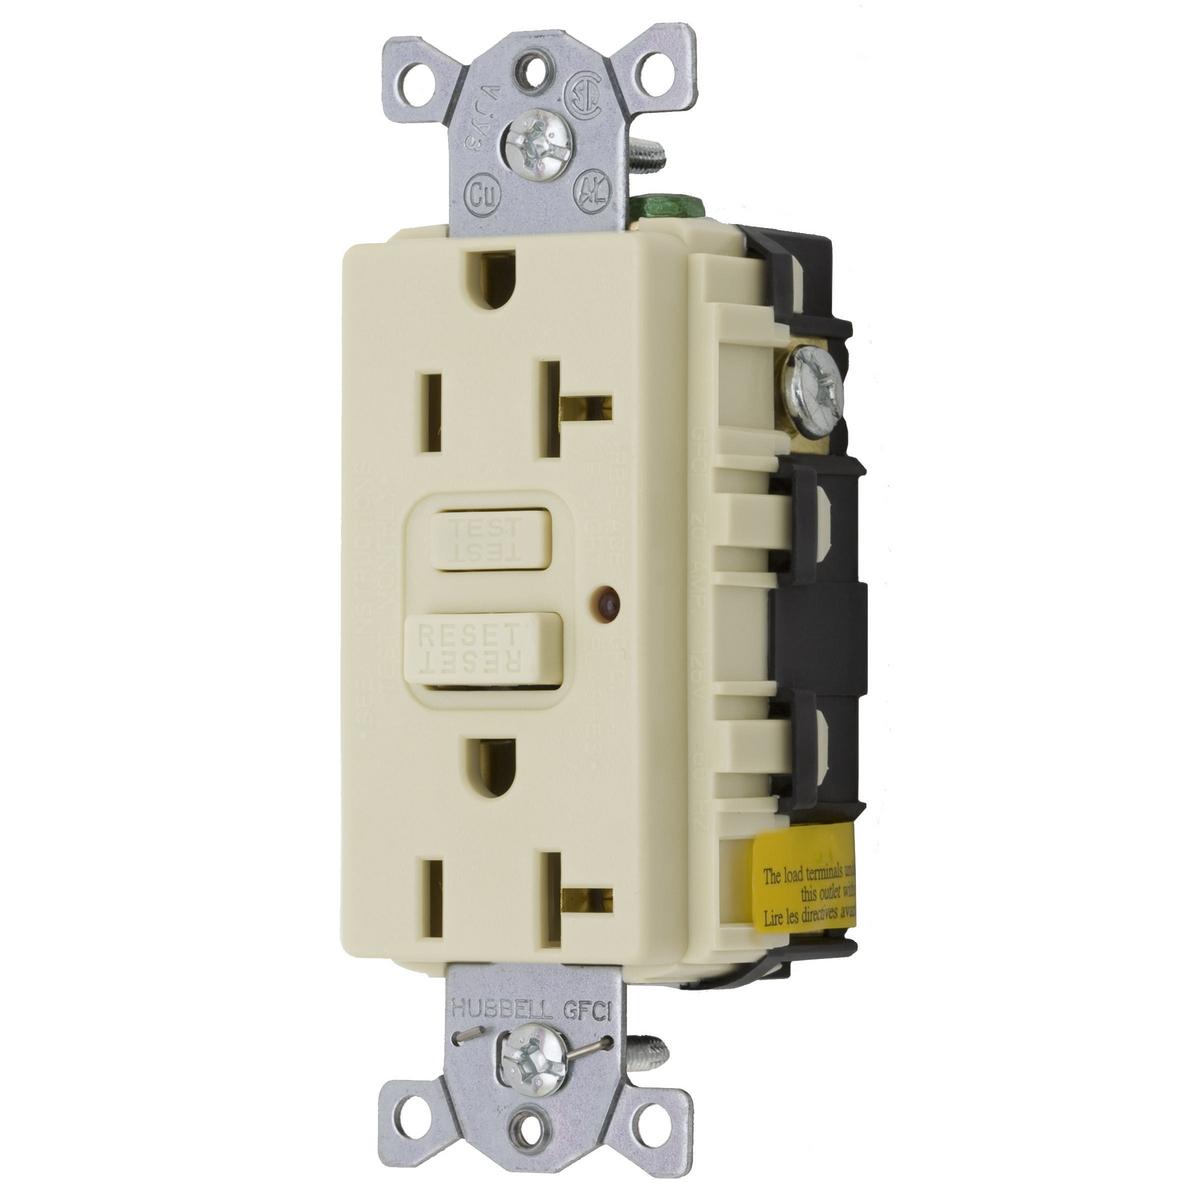 Hubbell GF20ILA 20 Amp 125 Volt 2-Pole 3-Wire NEMA 5-20R Ivory GFCI Receptacle with LED Indicator